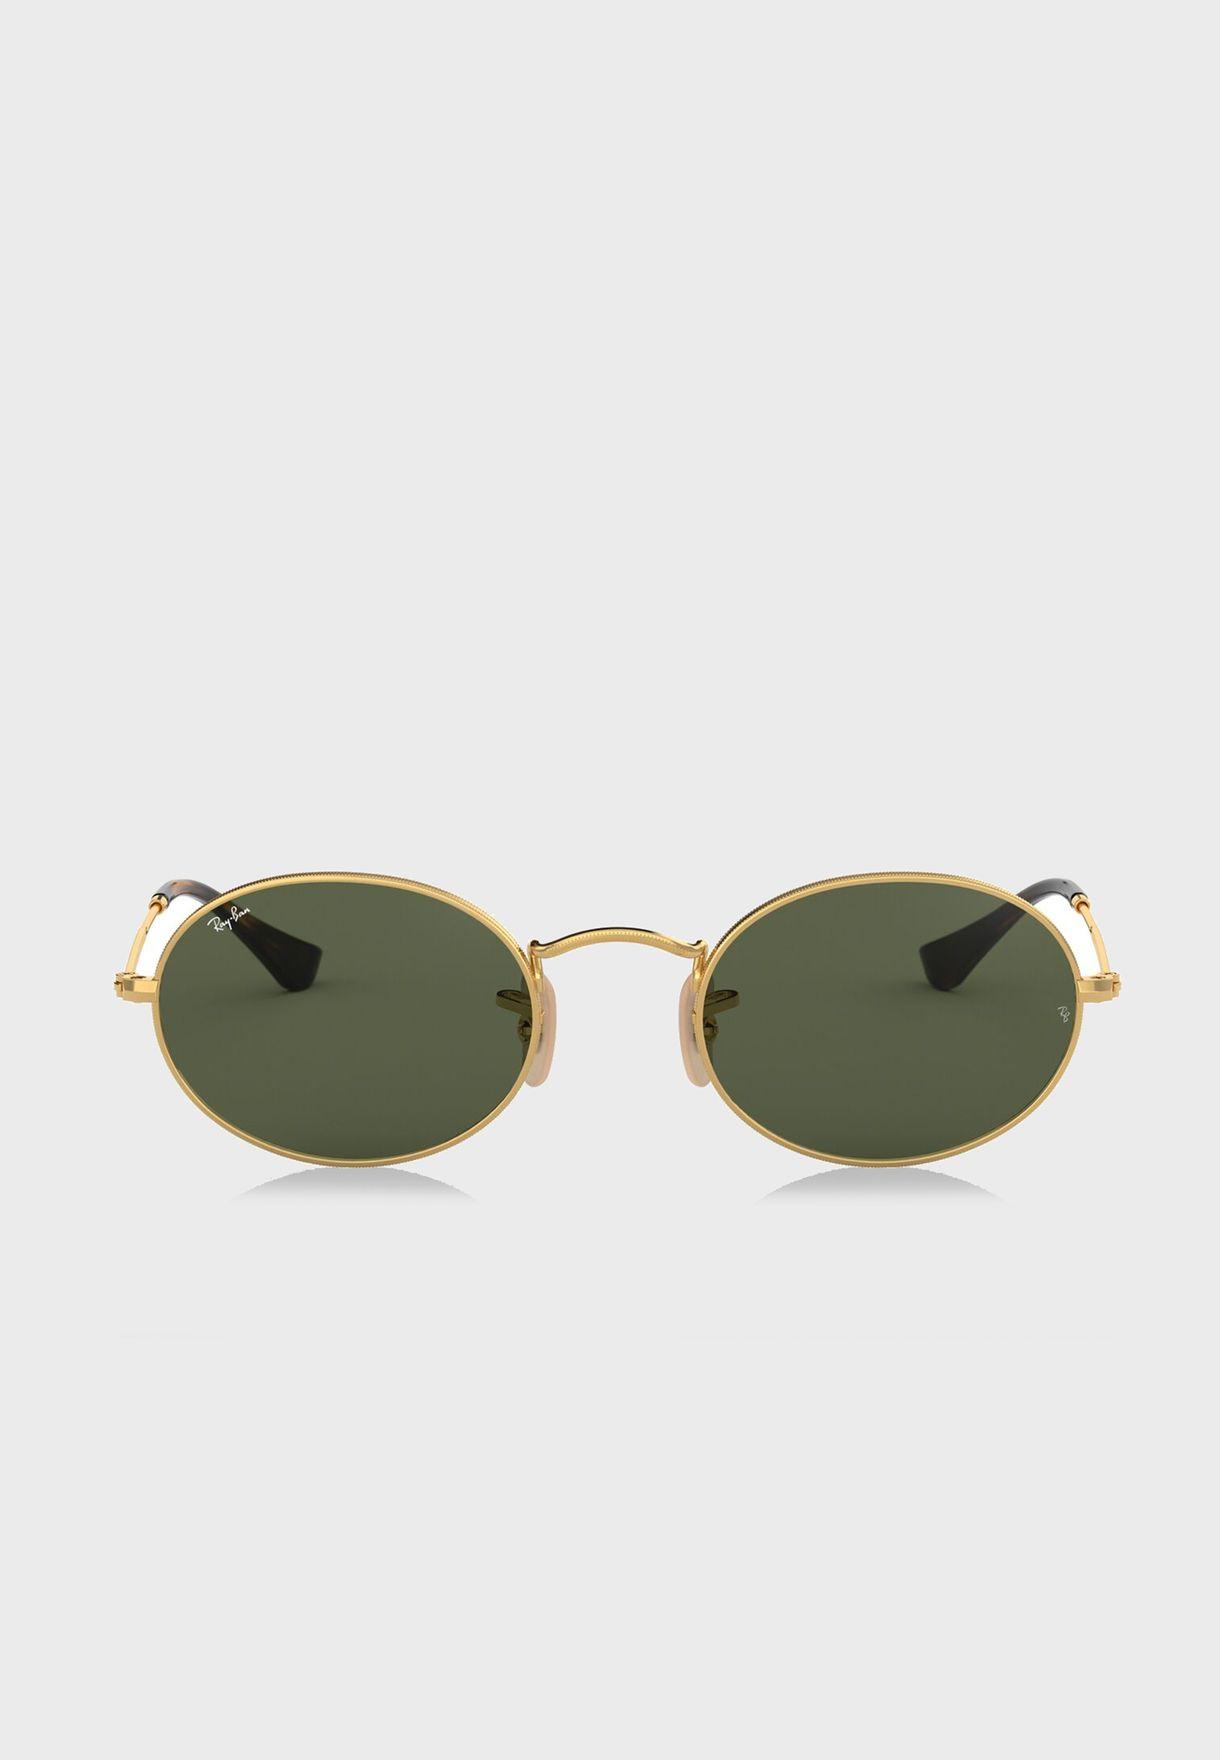 bfa8f65415 Shop Ray-Ban gold 0RB3547N Oval Flat Lenses Sunglasses 8053672611526 ...